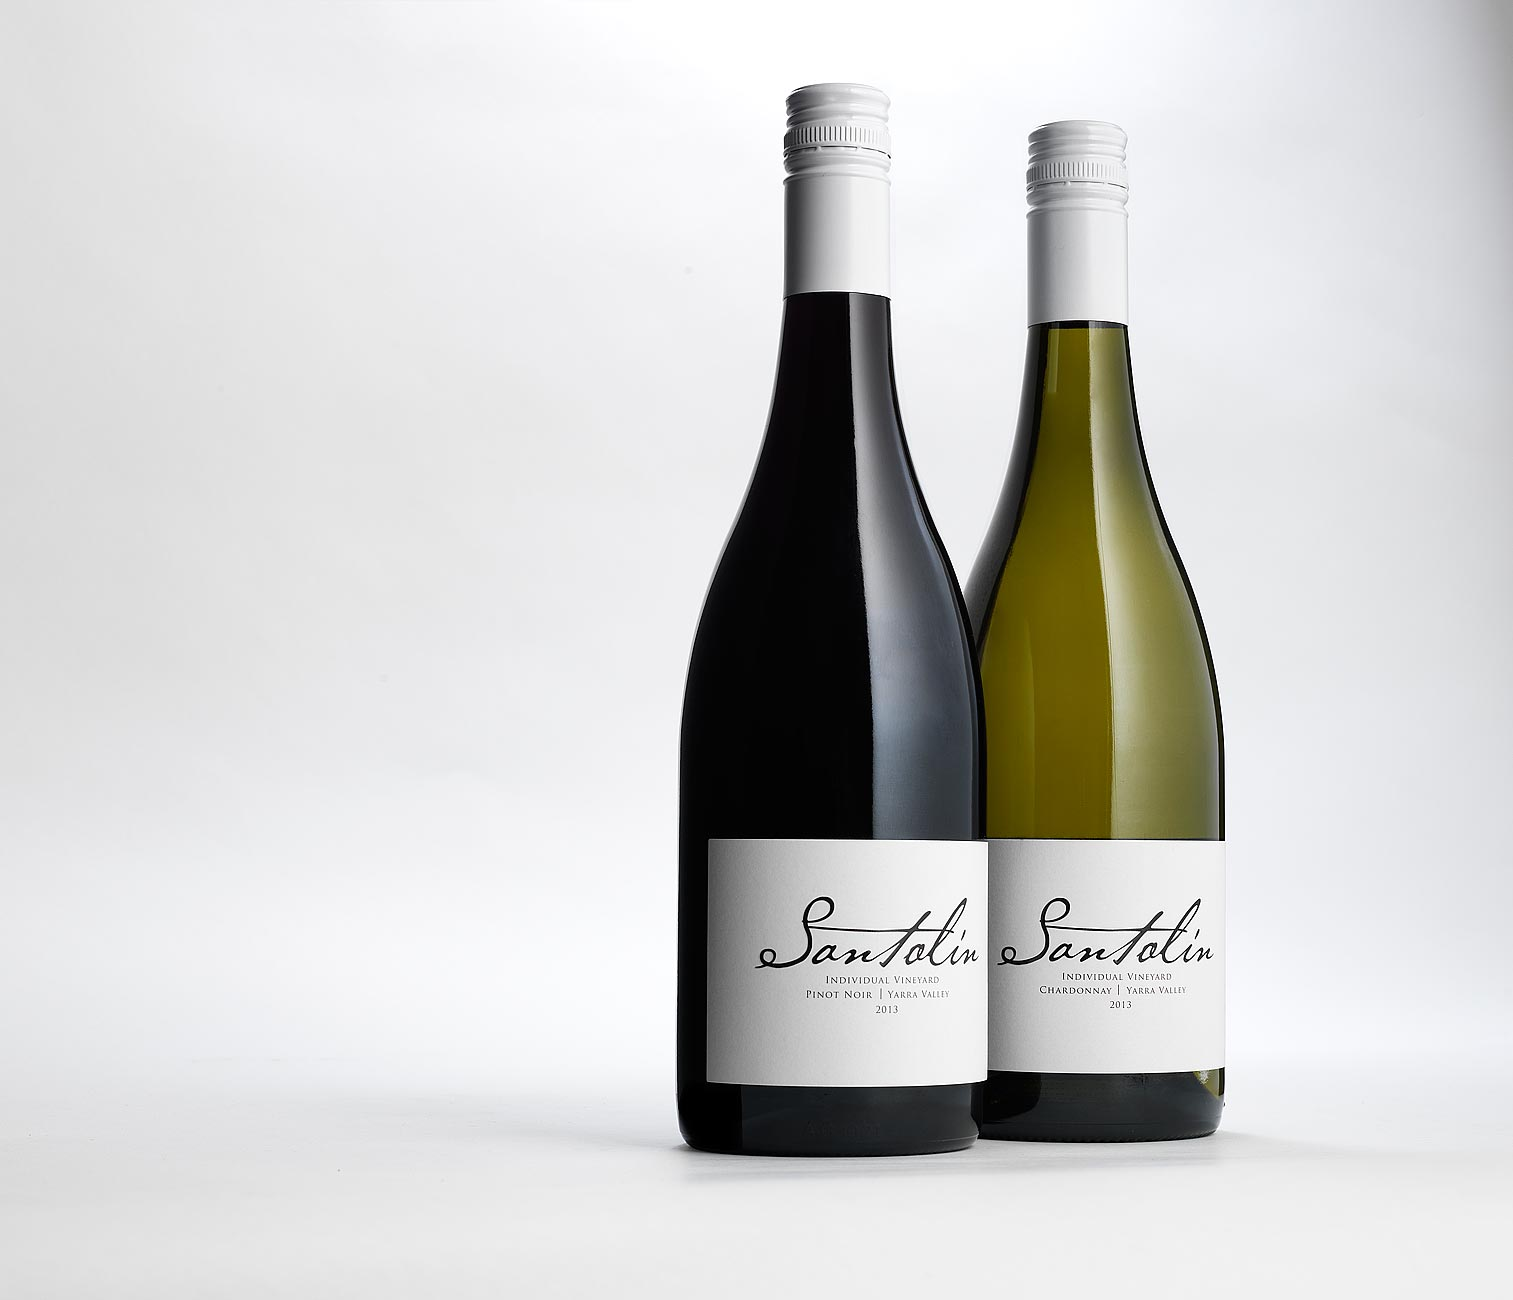 wine-bottle-photography-4.jpg